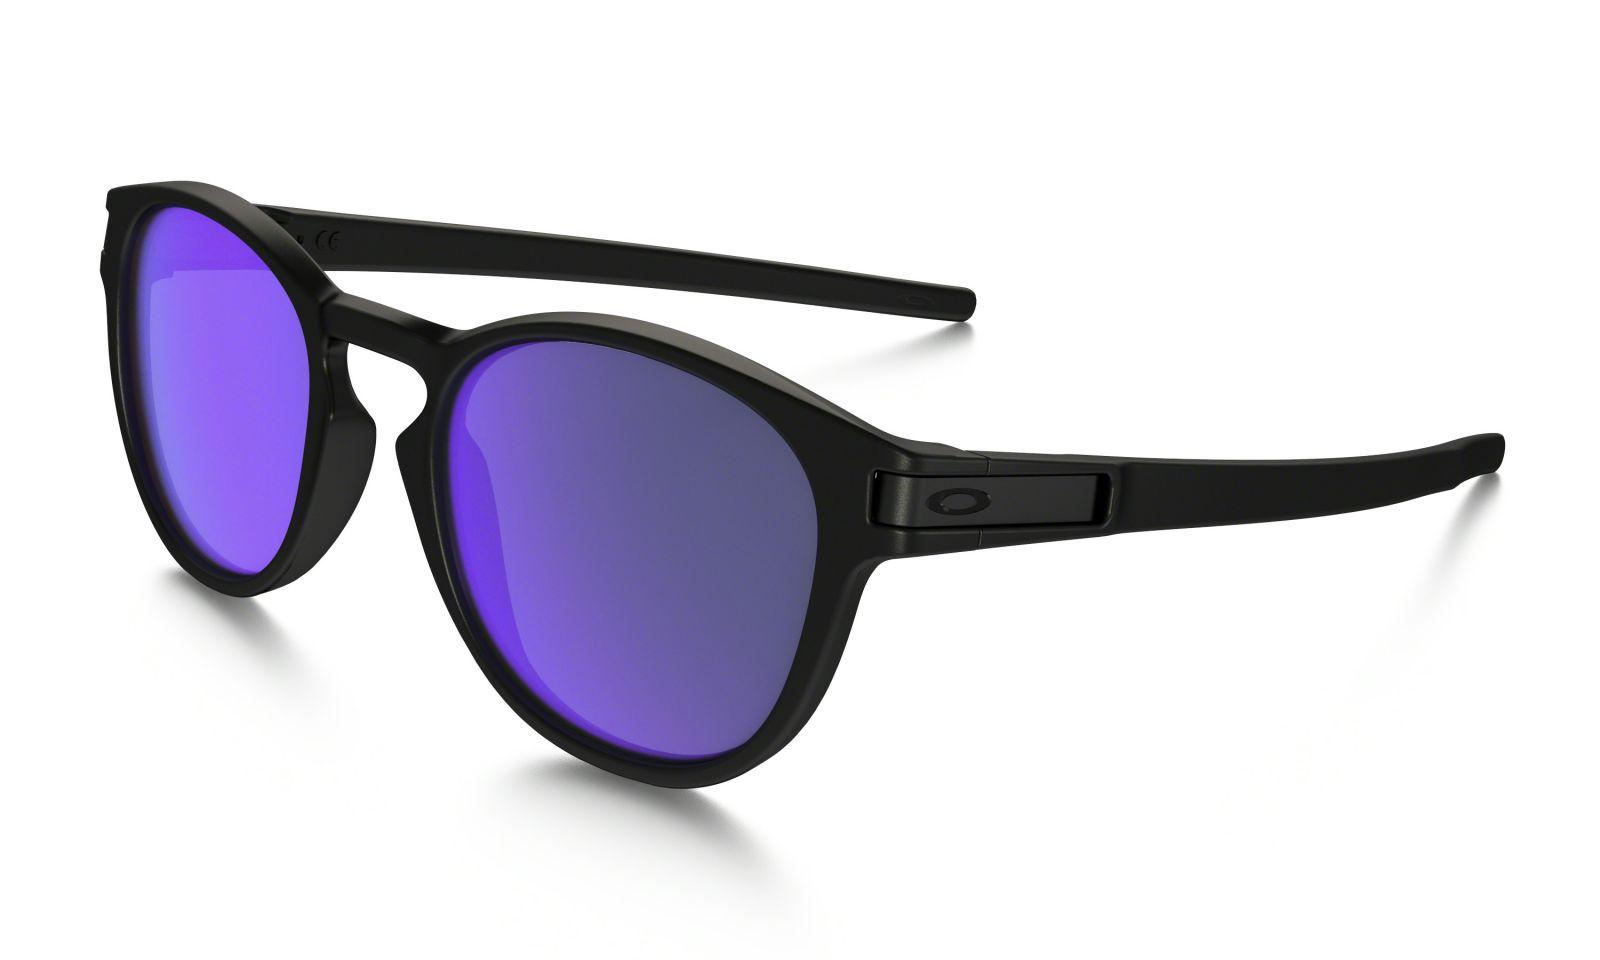 Brýle Oakley Latch - Matte Black/Violet Iridium